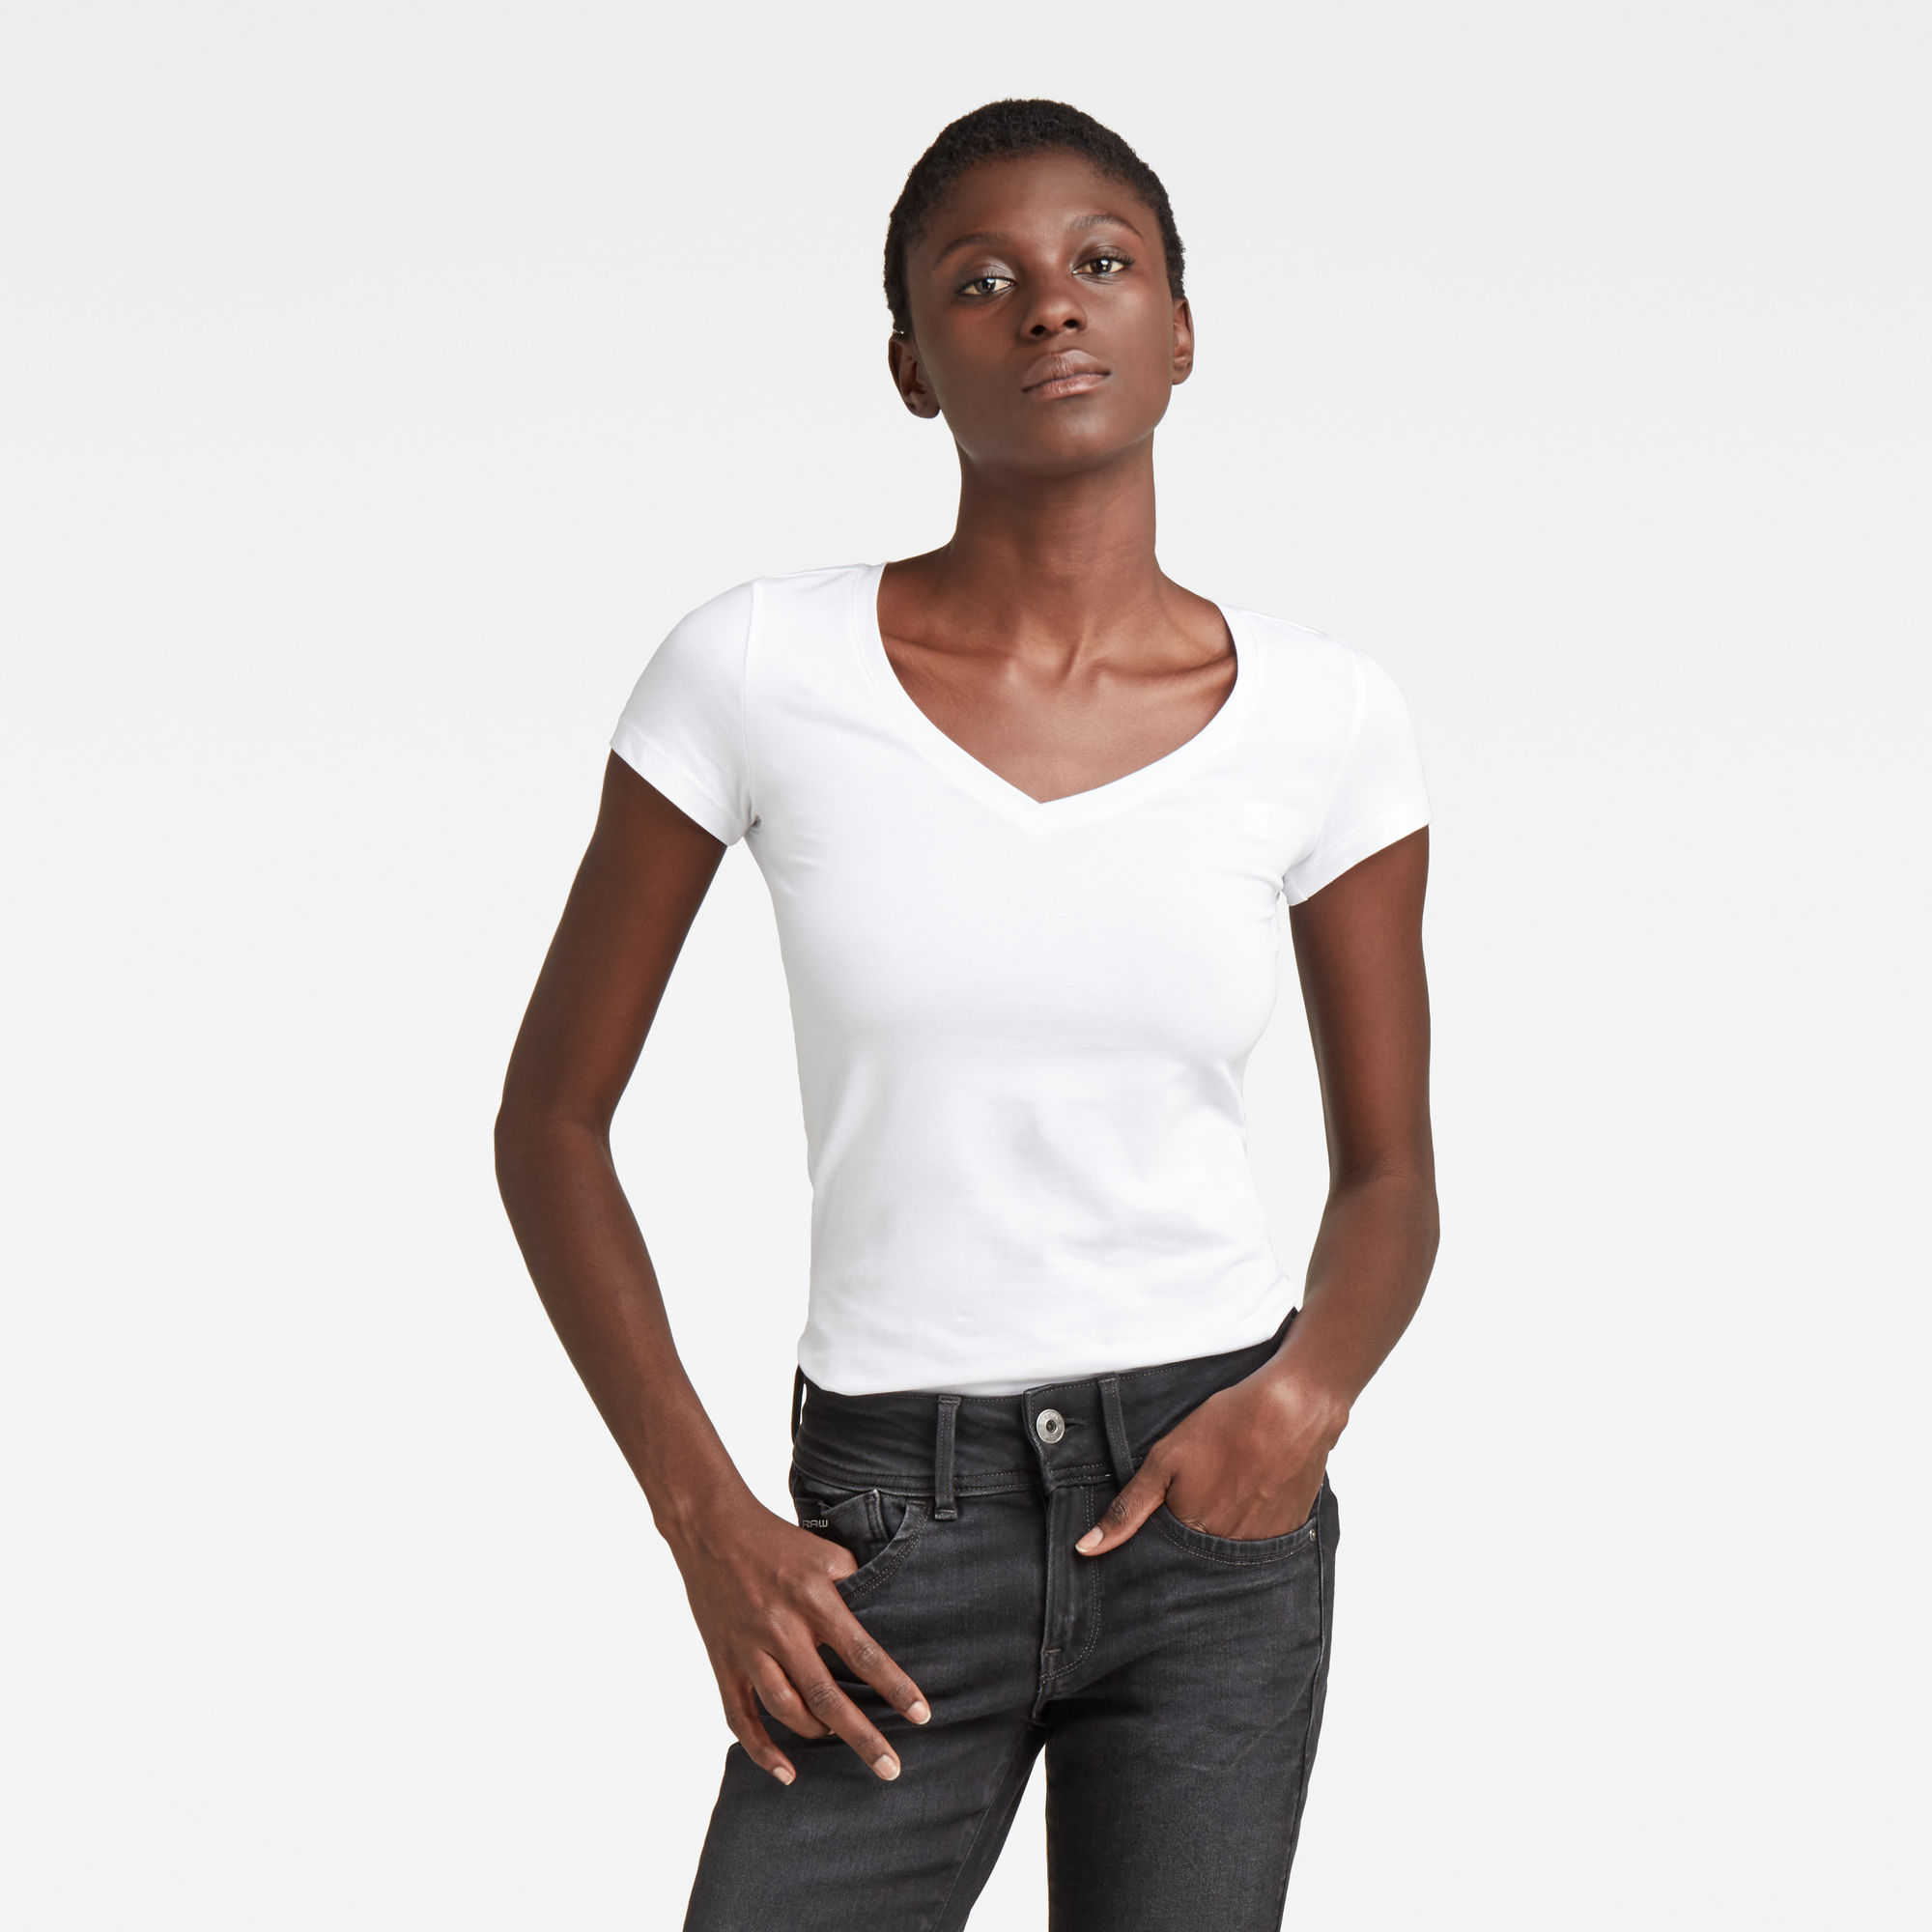 G-Star RAW Dames Basic V-Neck Cap Sleeve T-Shirt Wit